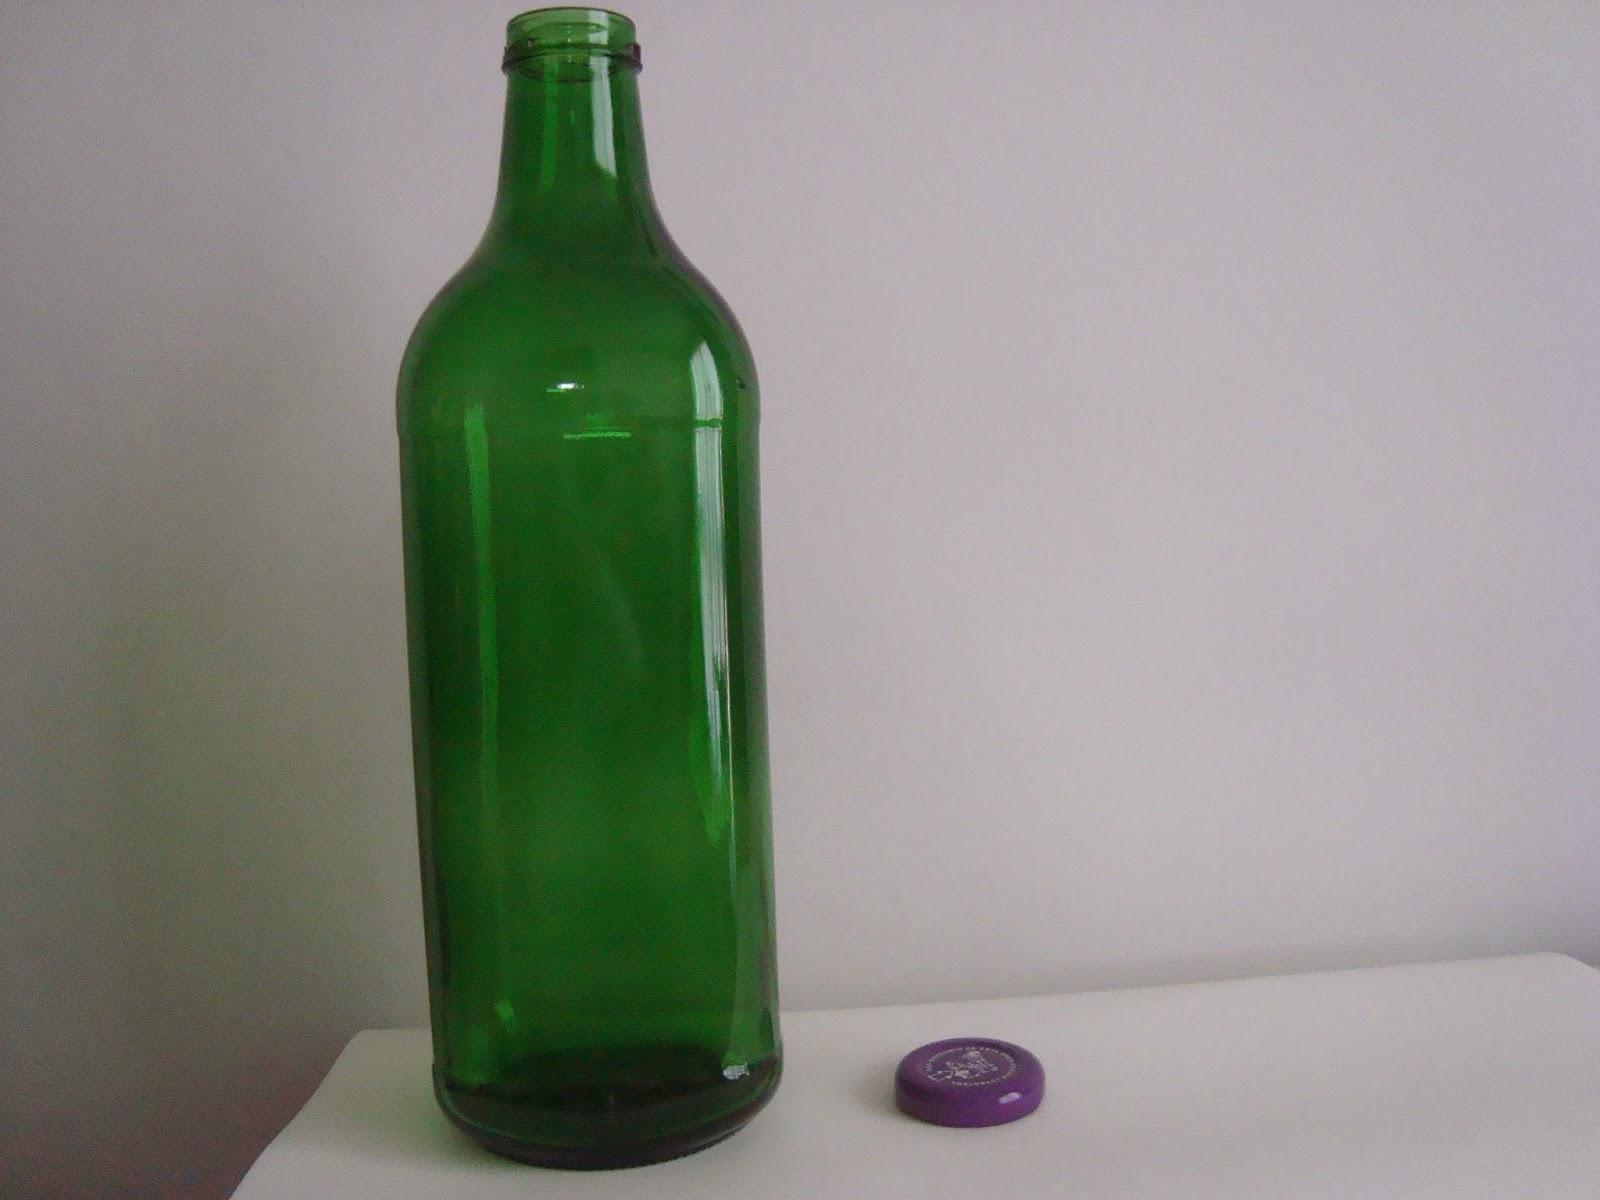 1 garrafa de suco de uva Primer